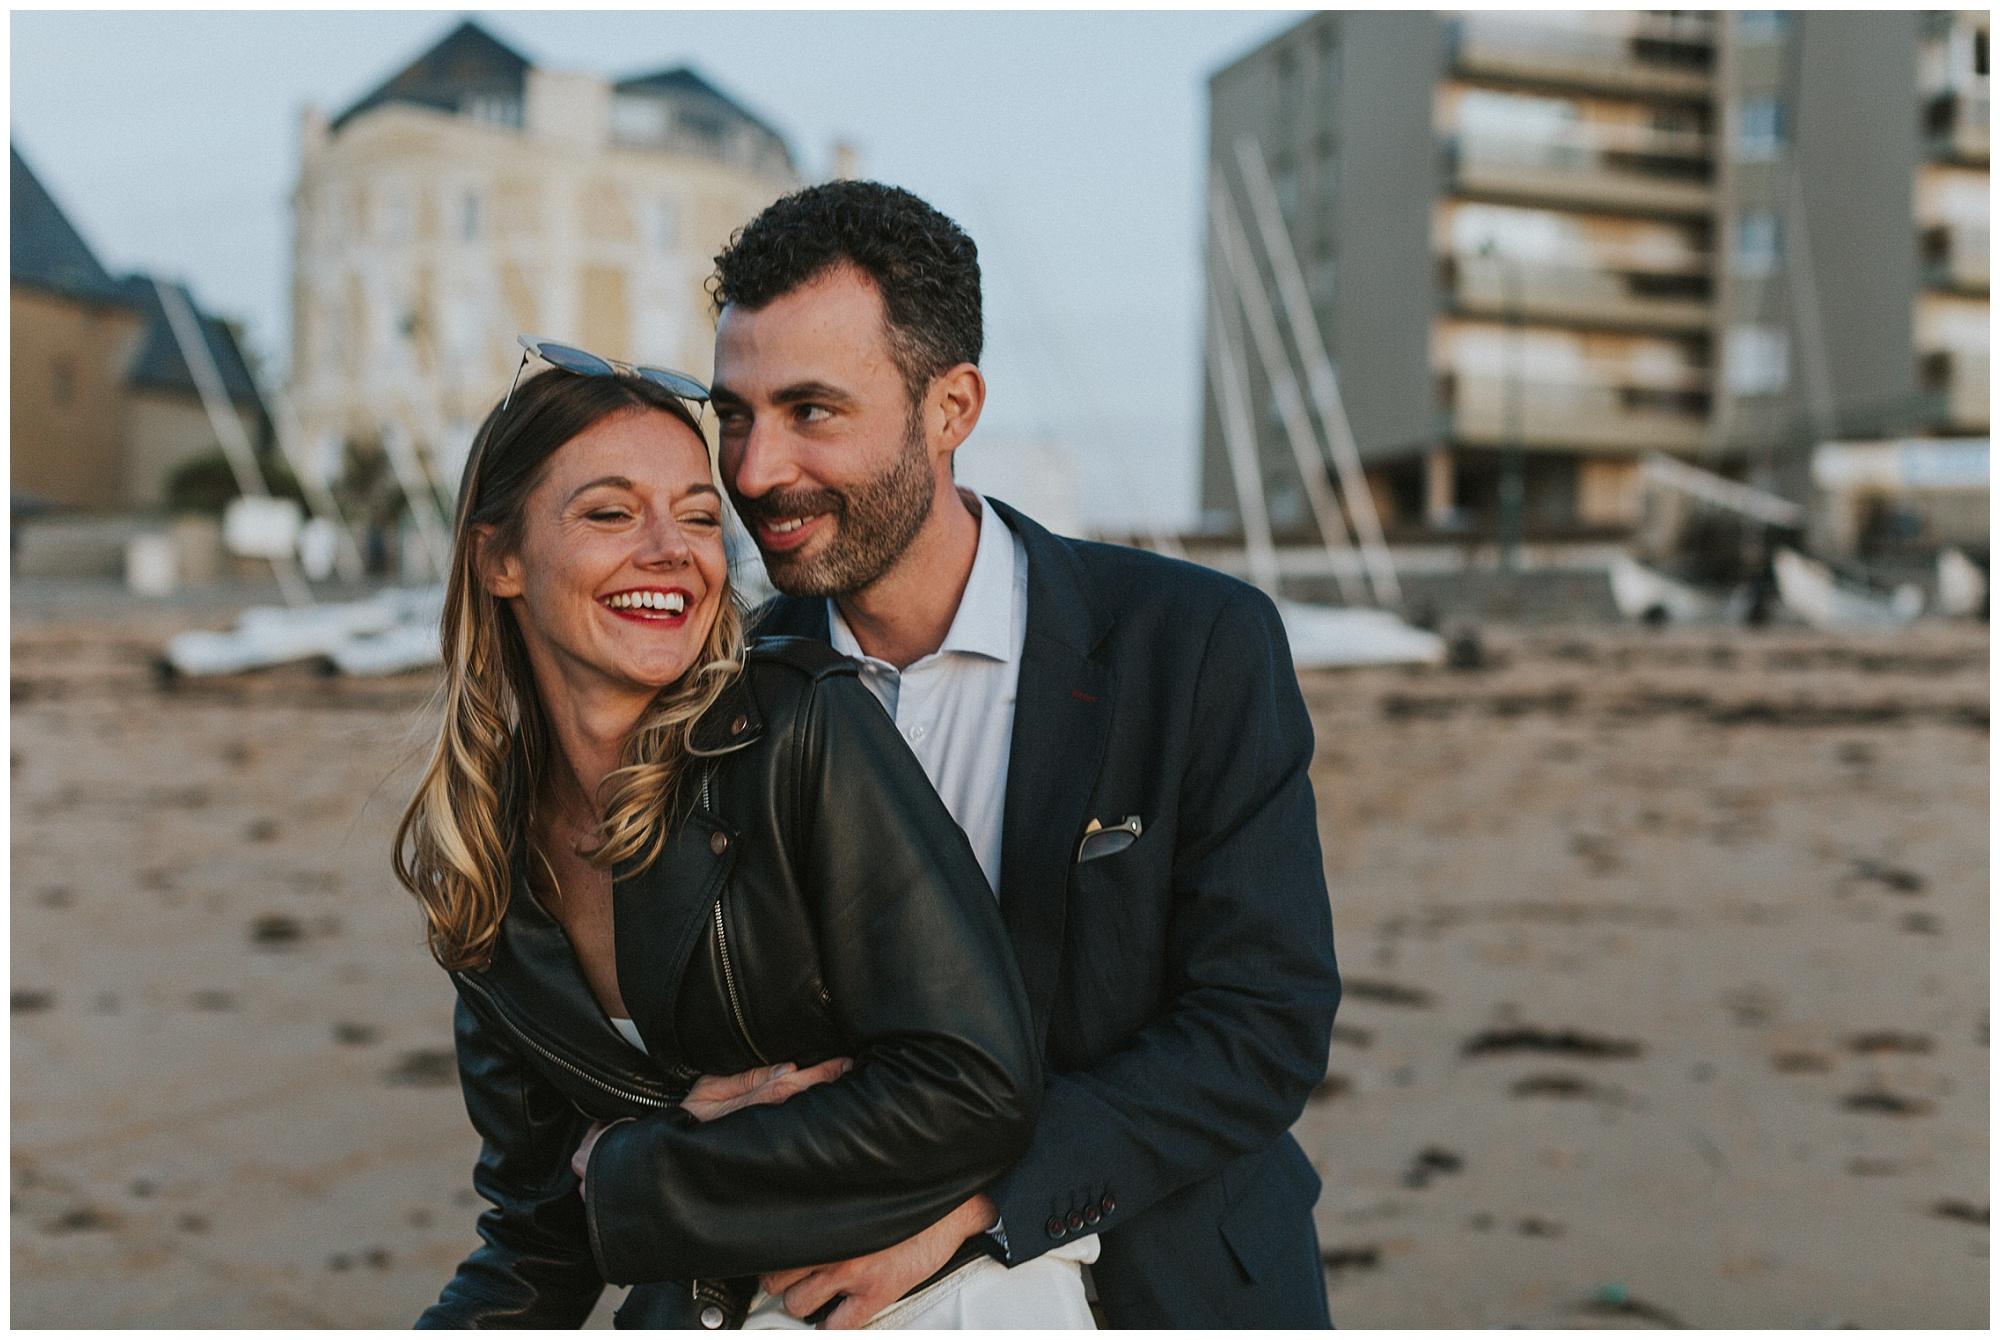 Kateryna-photos-photographe-mariage-bretagne-saint-malo-finistere-cotes-darmor-wedding_0096.jpg